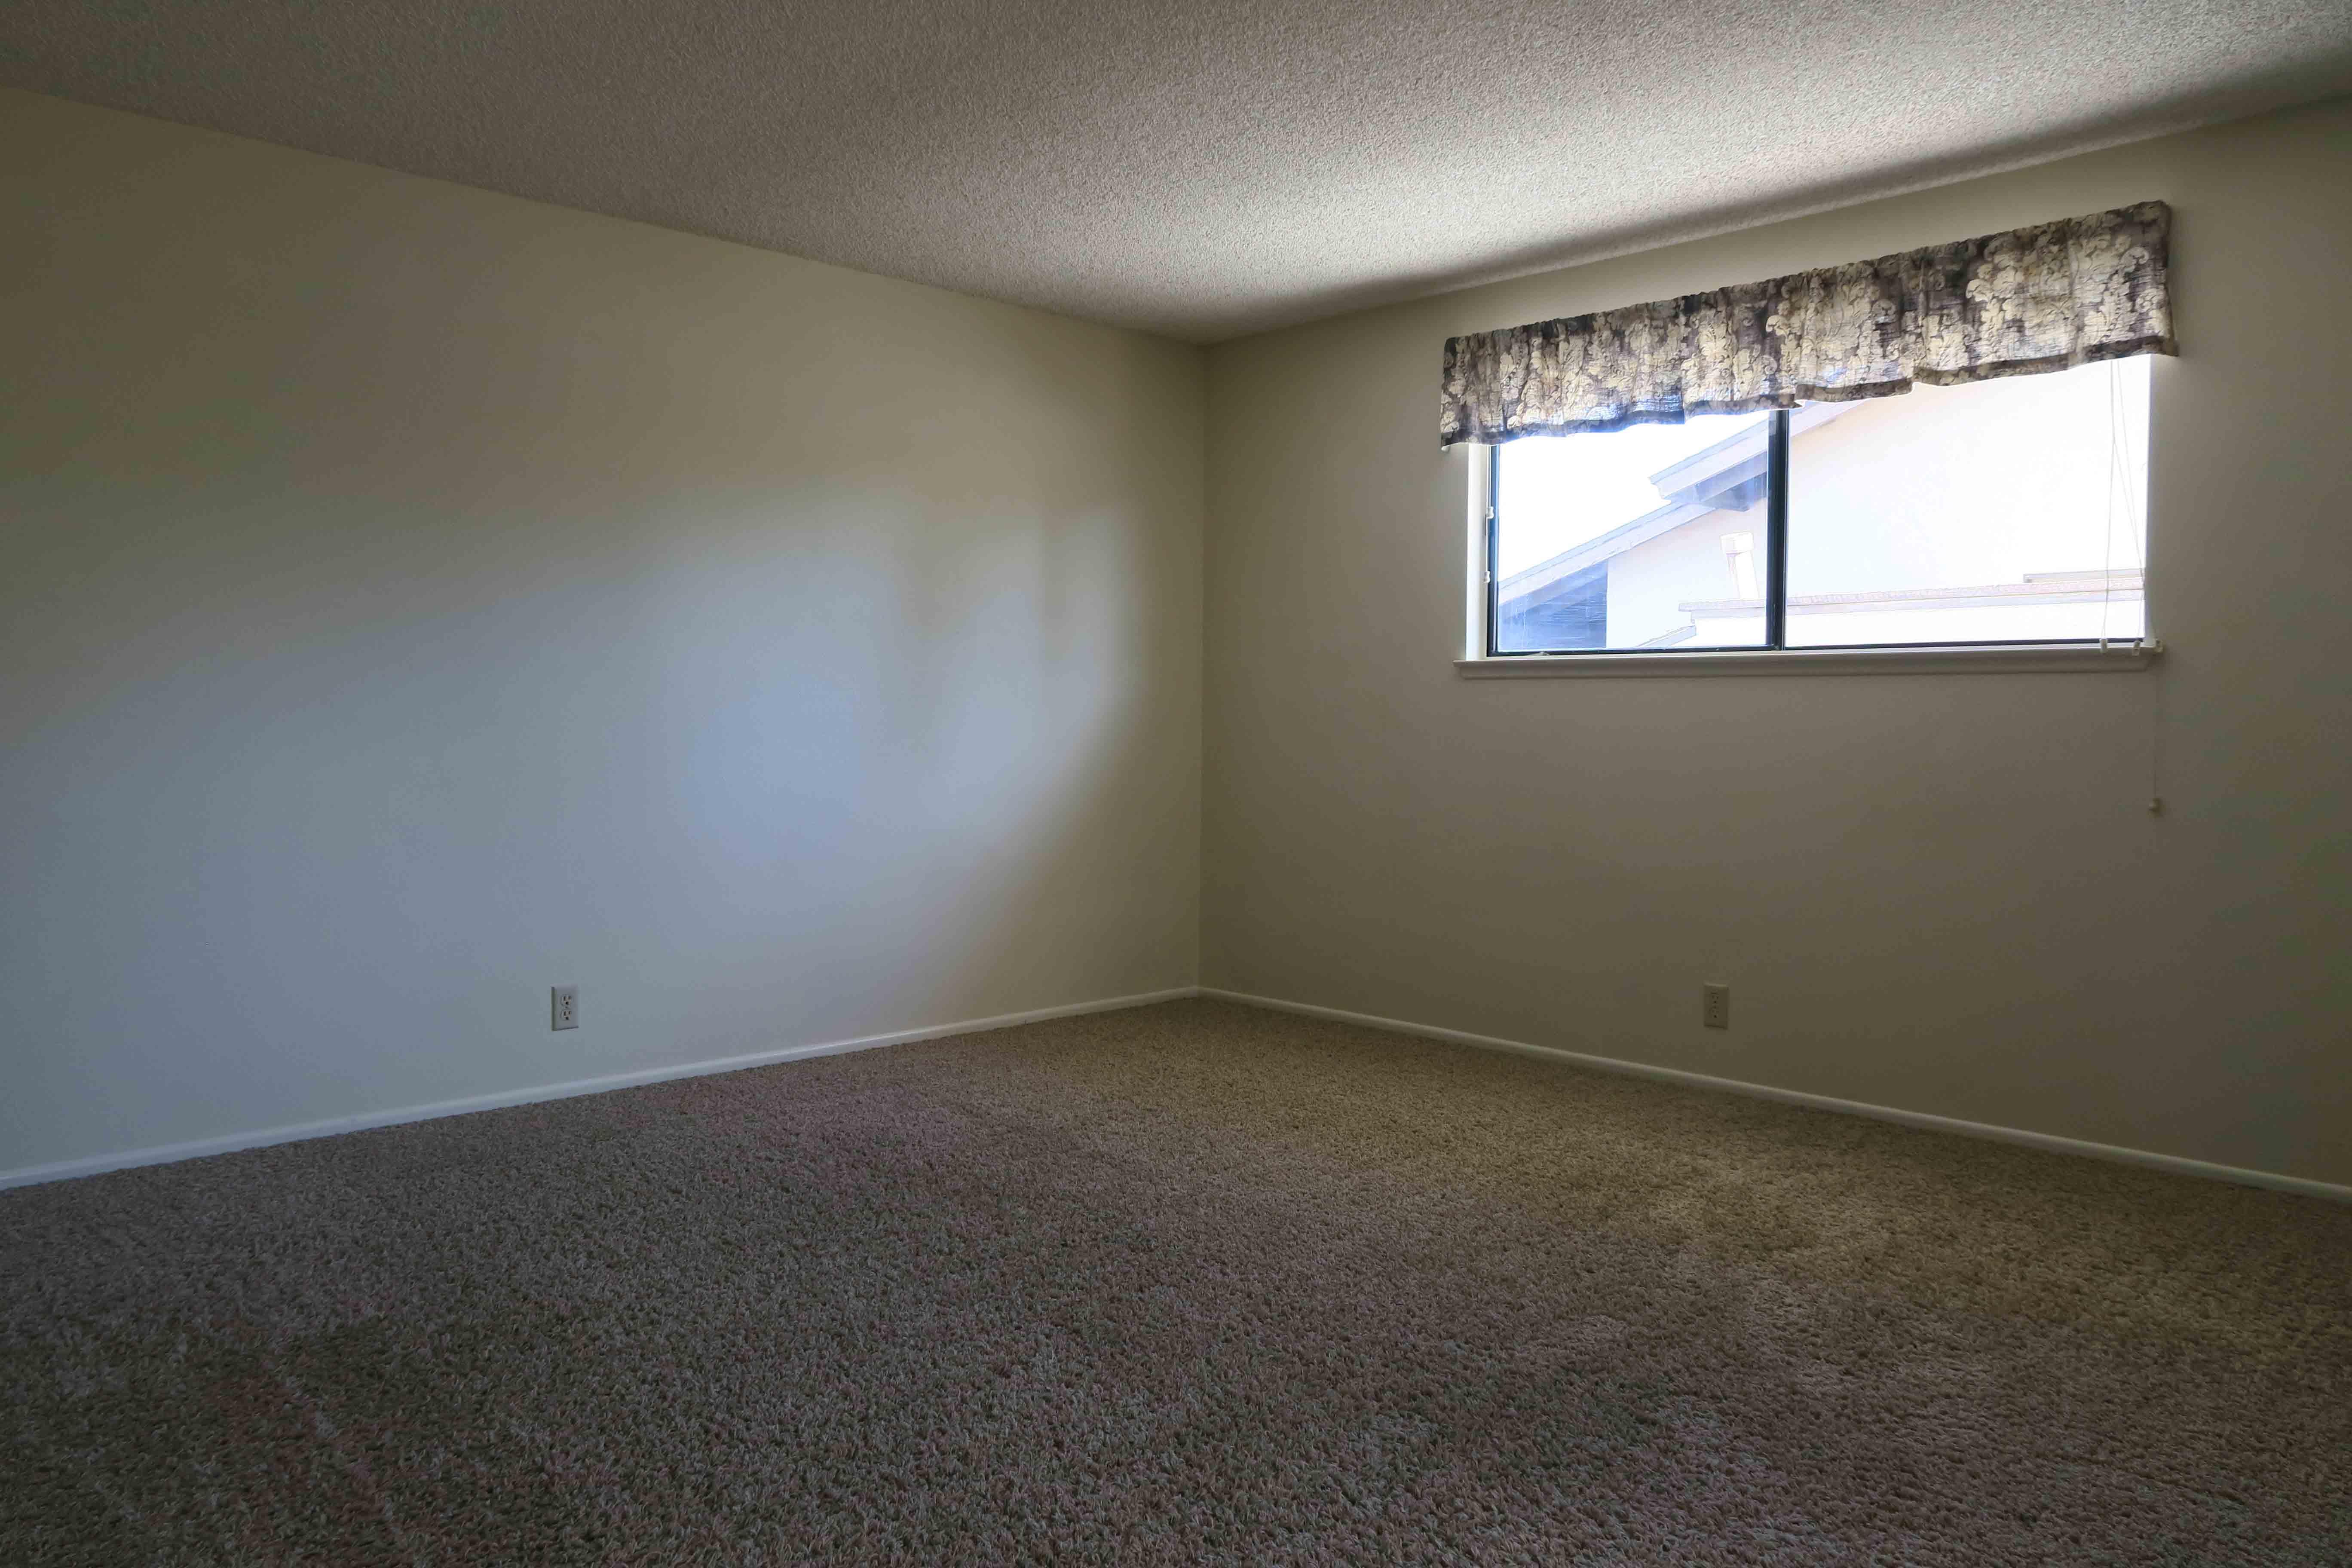 1841 Adelaide Ct, Oxnard CA 93035 Upstairs Bedroom 1